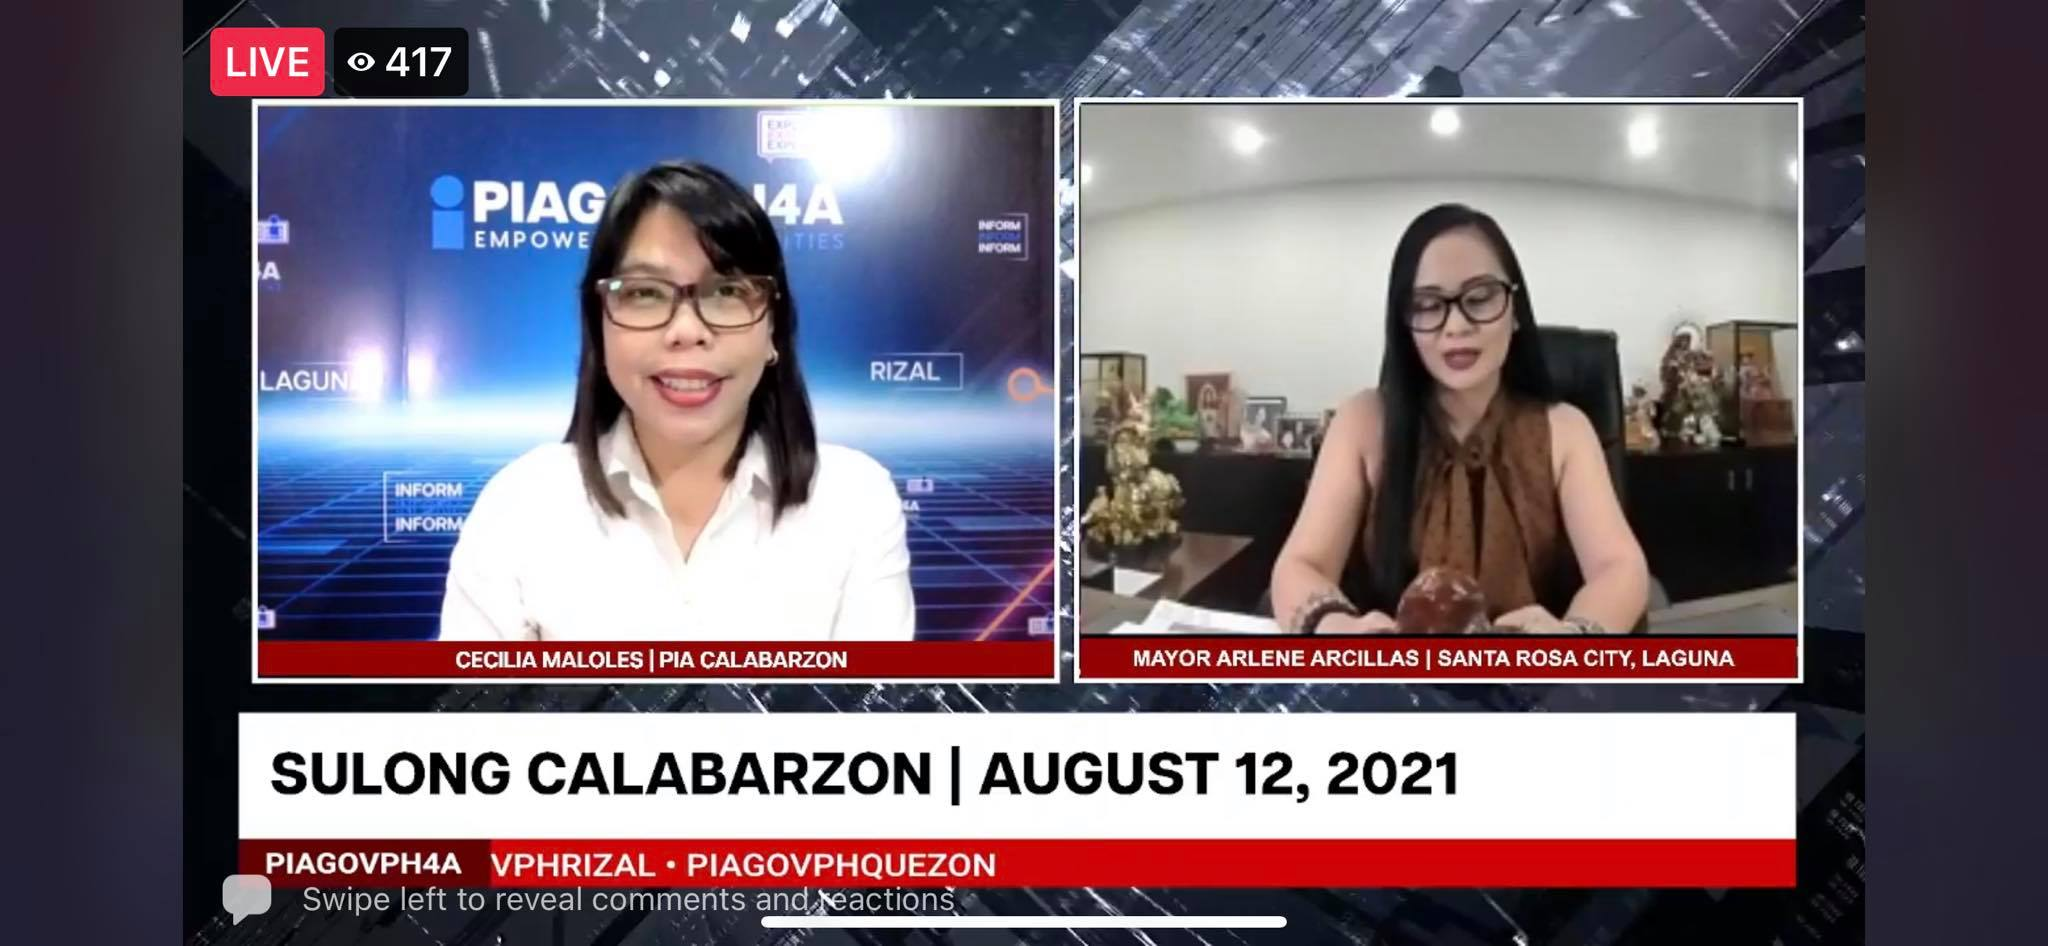 SULONG CALABARZON AUGUST 12, 2021